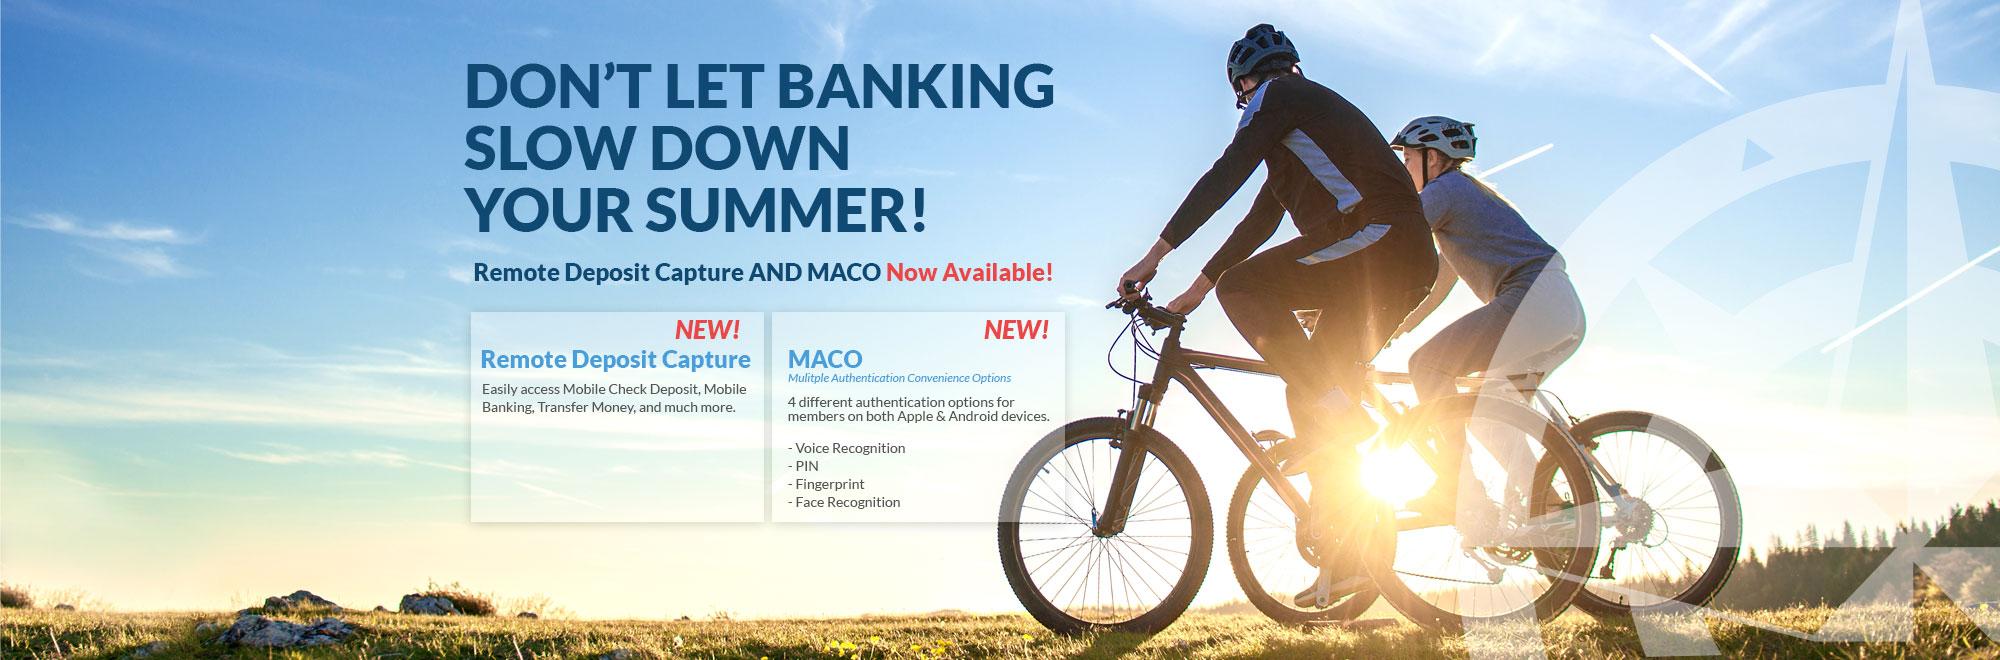 Remote Check Deposit/MACO